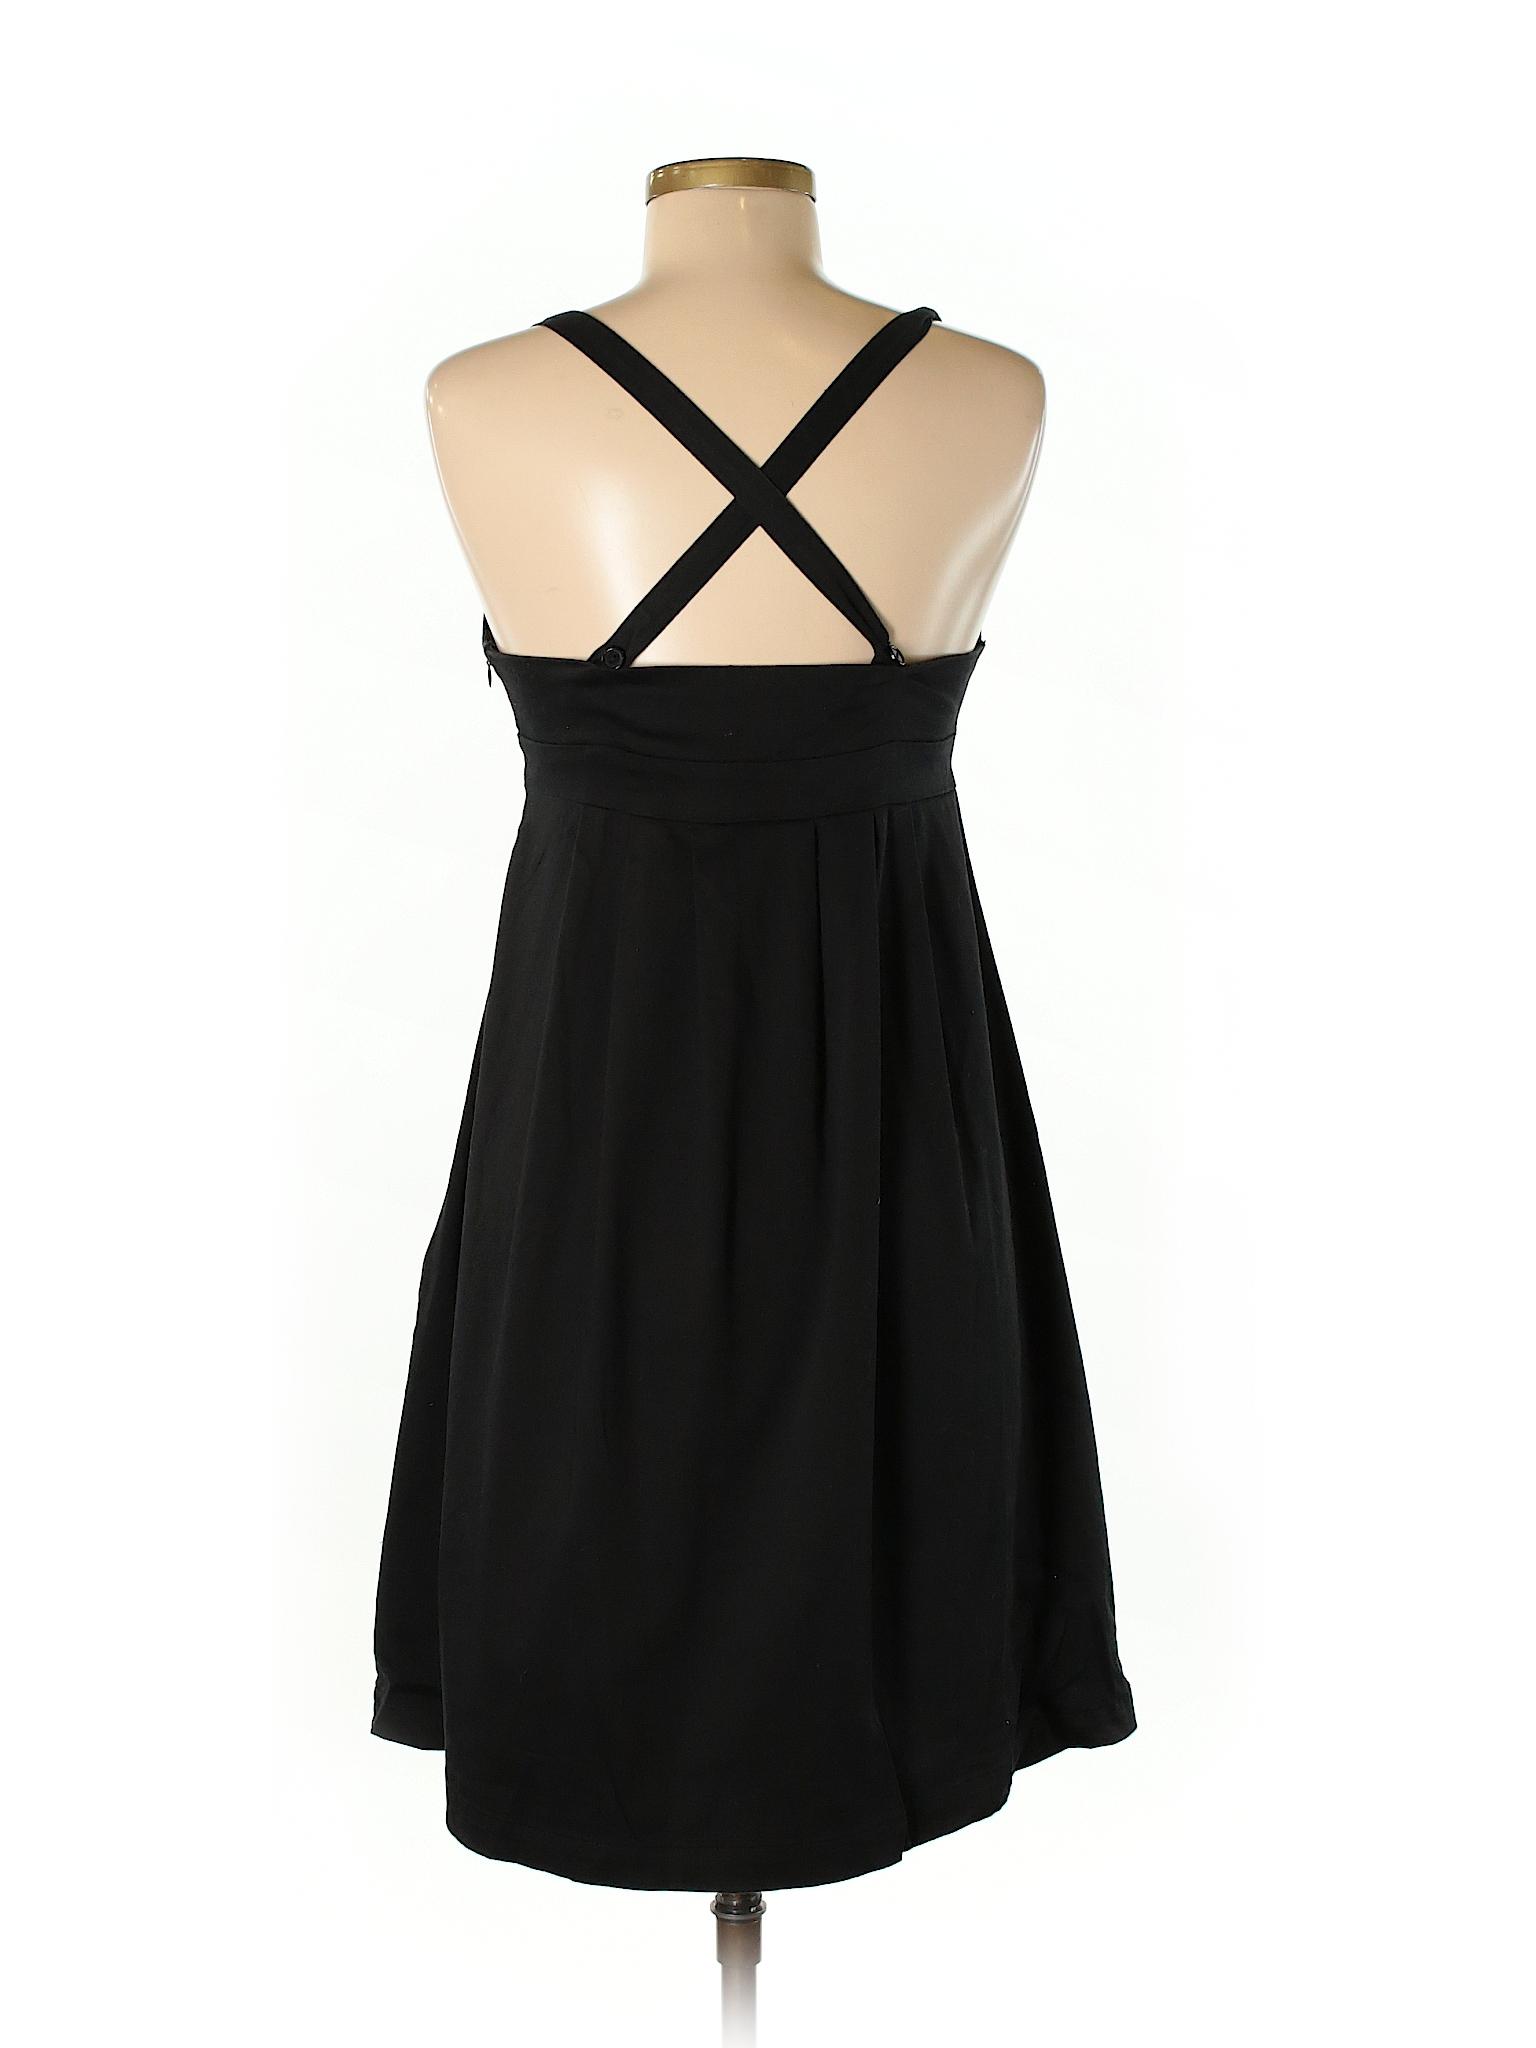 Kersh Casual Boutique winter Kersh Casual Dress winter Boutique Dress 6OxxaHY